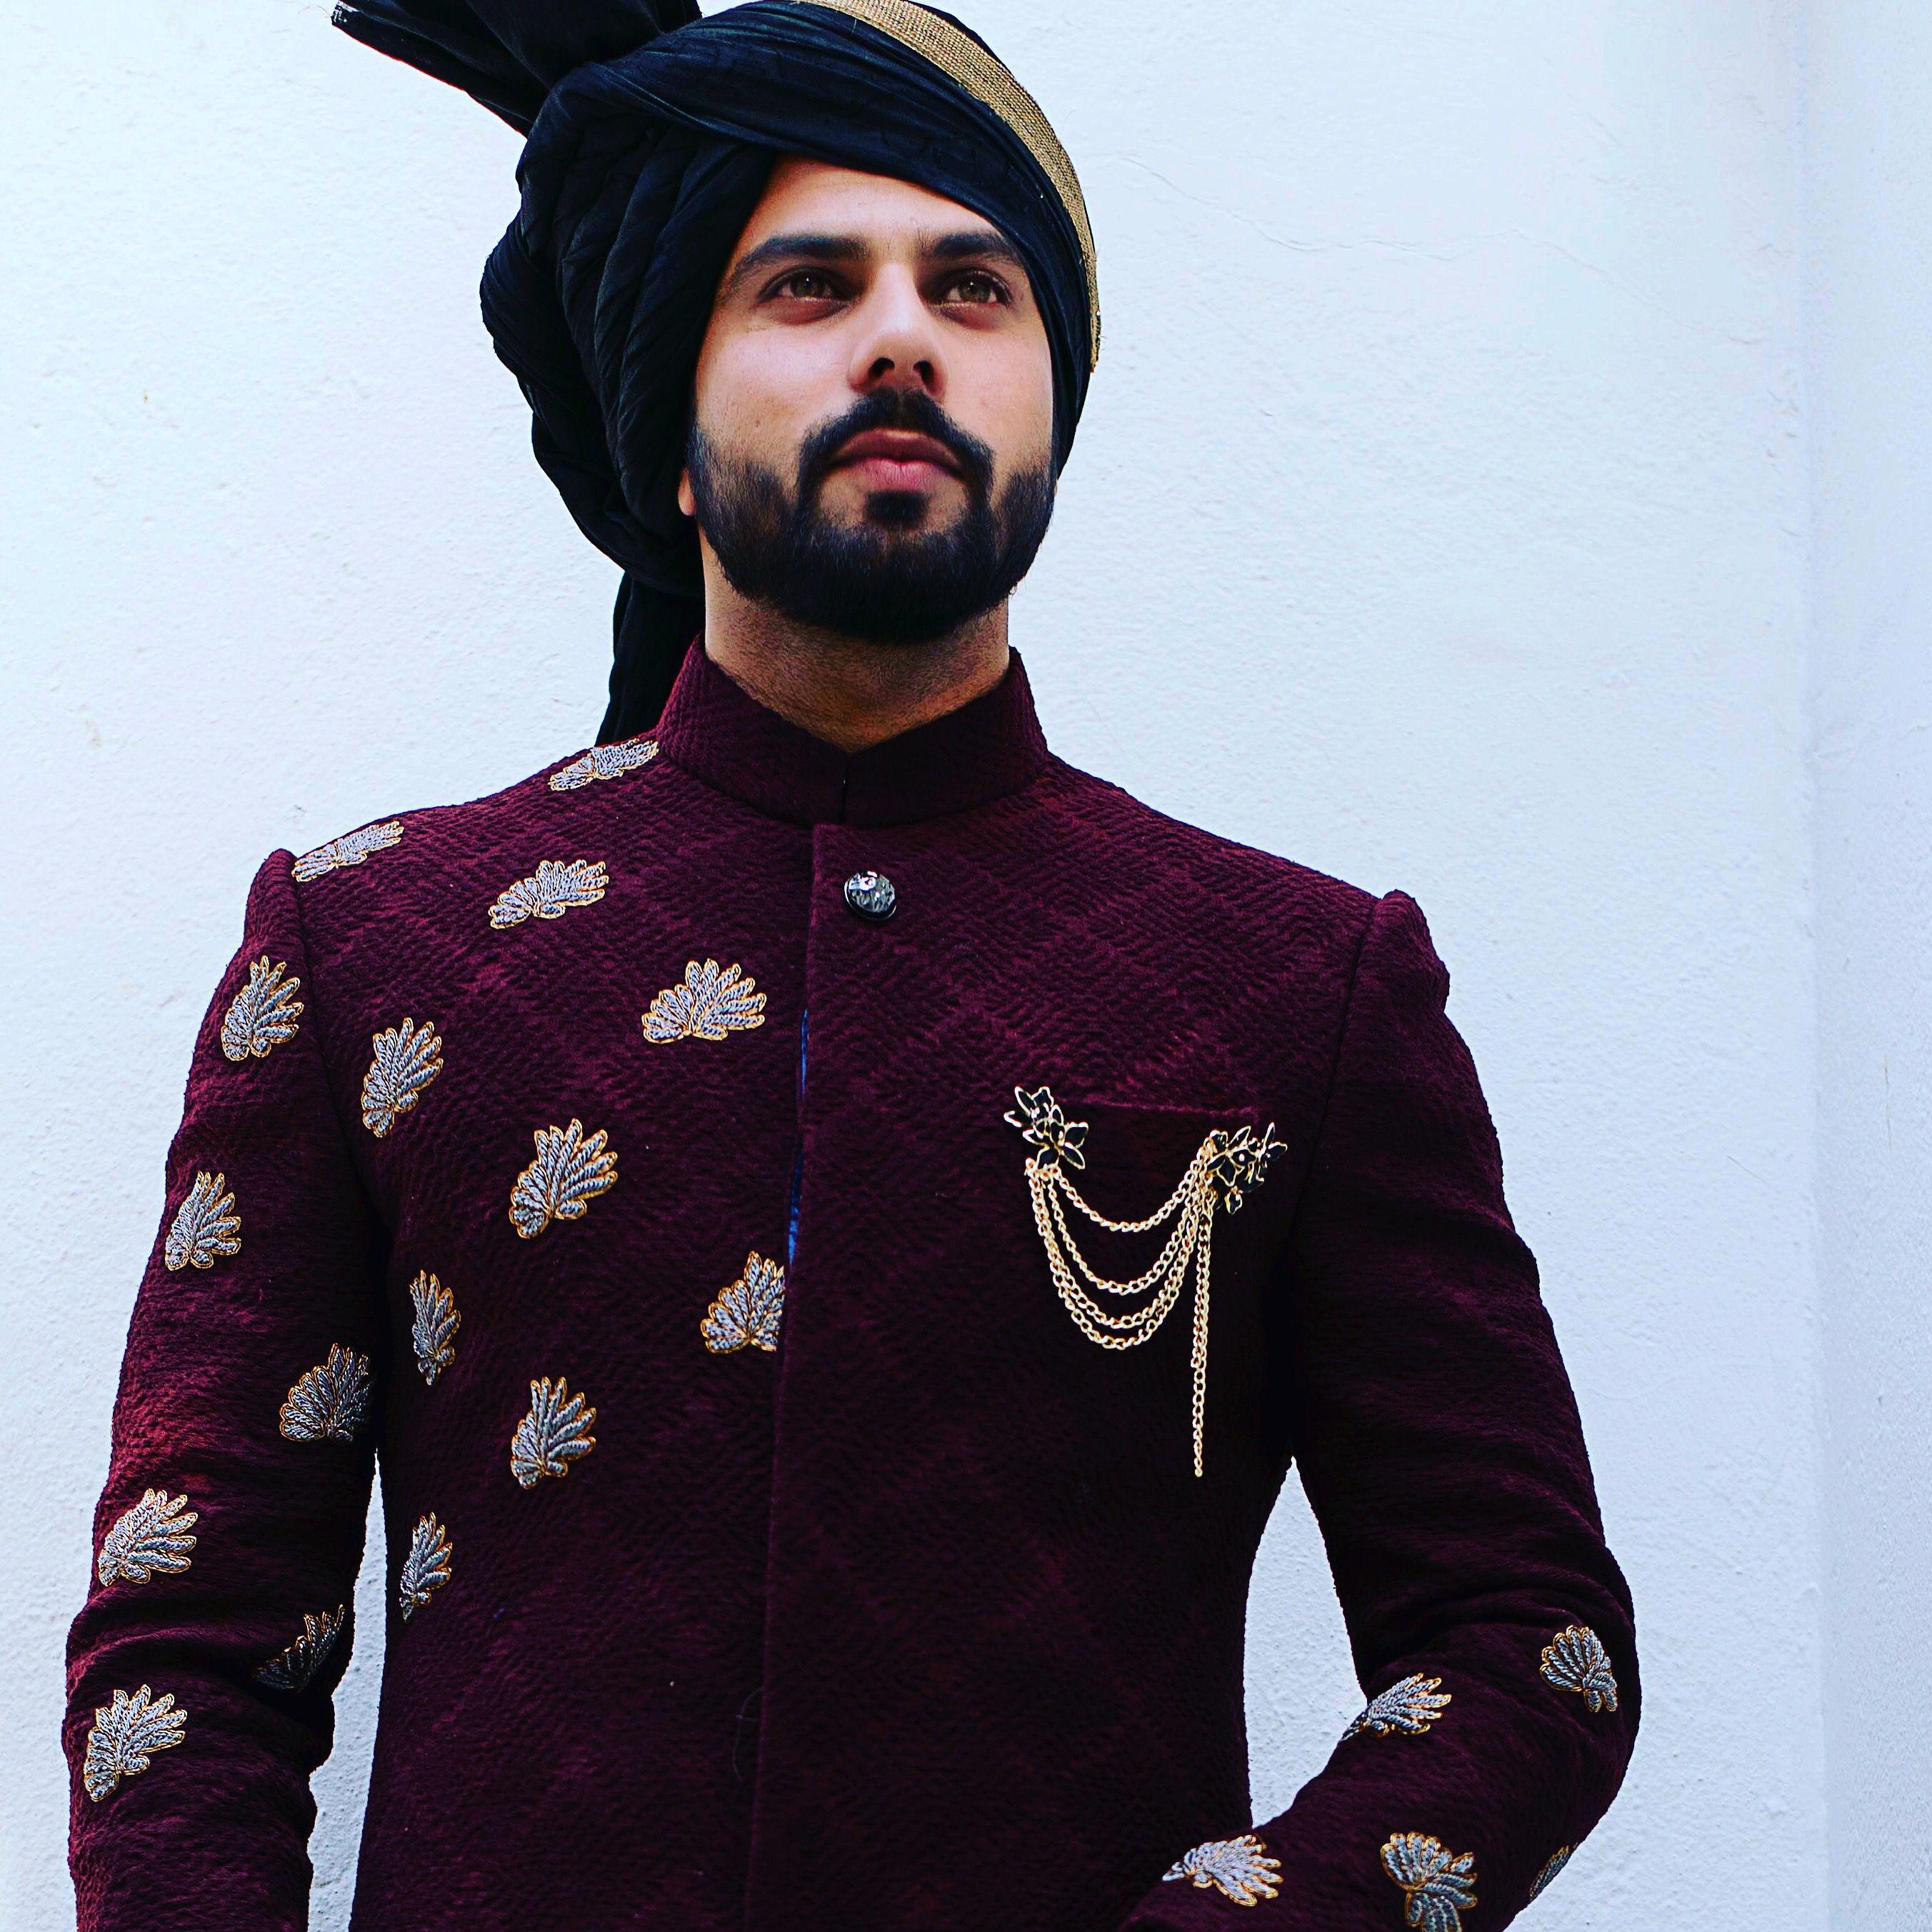 Wedding Gown For Men: Exquisite Handcrafted Zardozi Motifs On A Textured